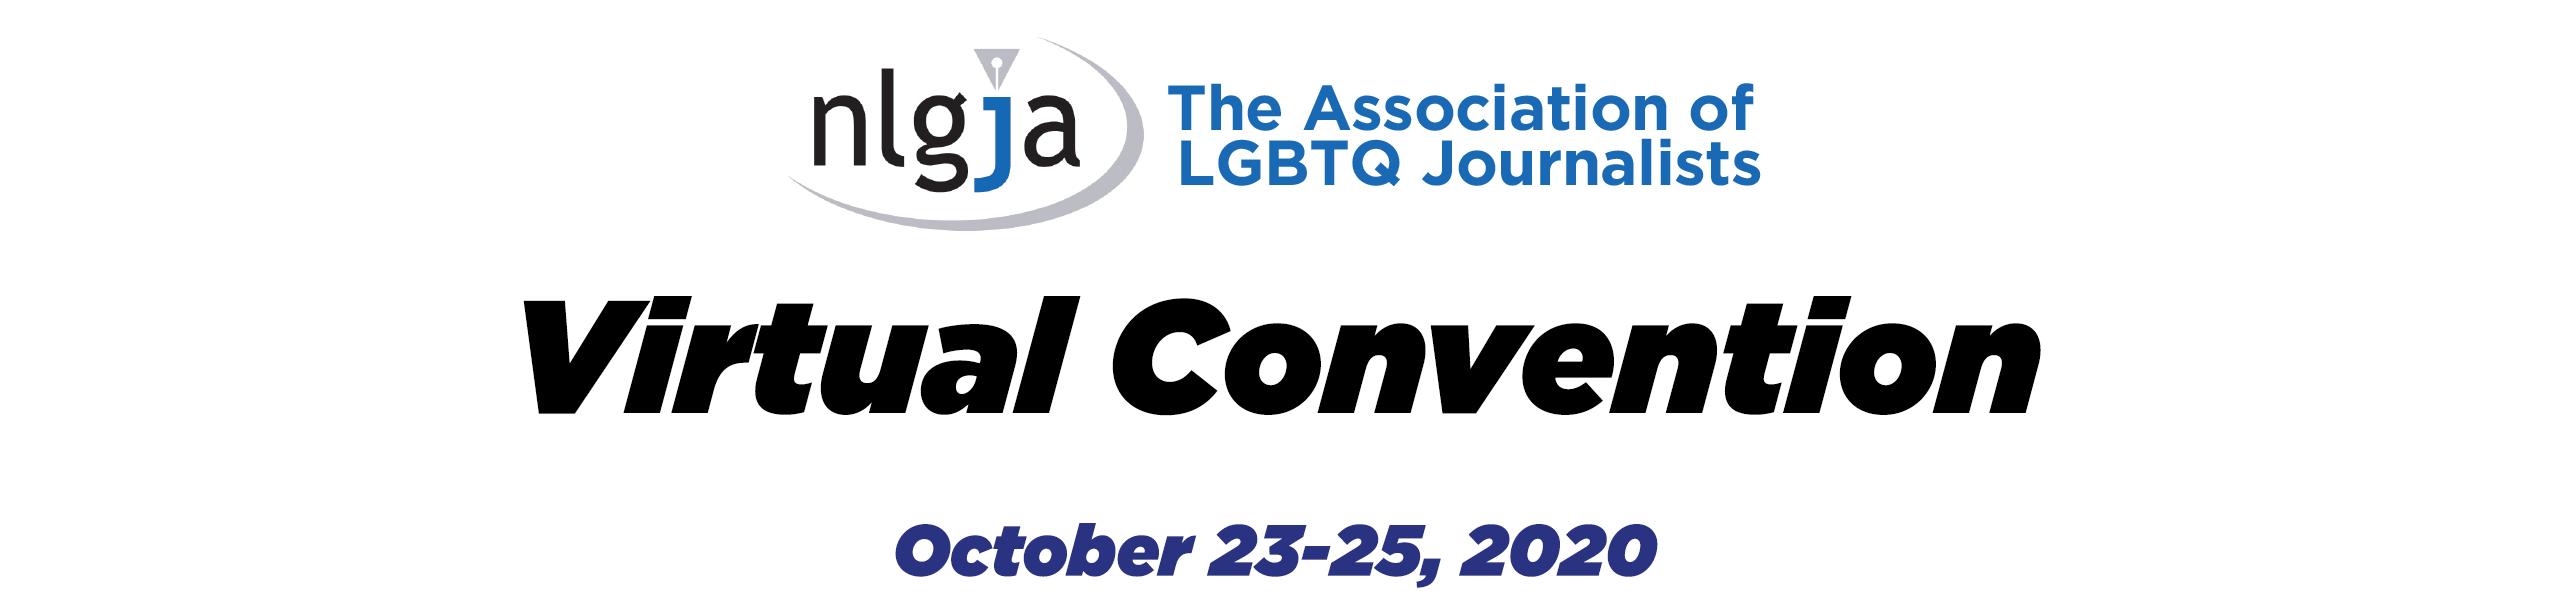 NLGJA 2020 National Convention